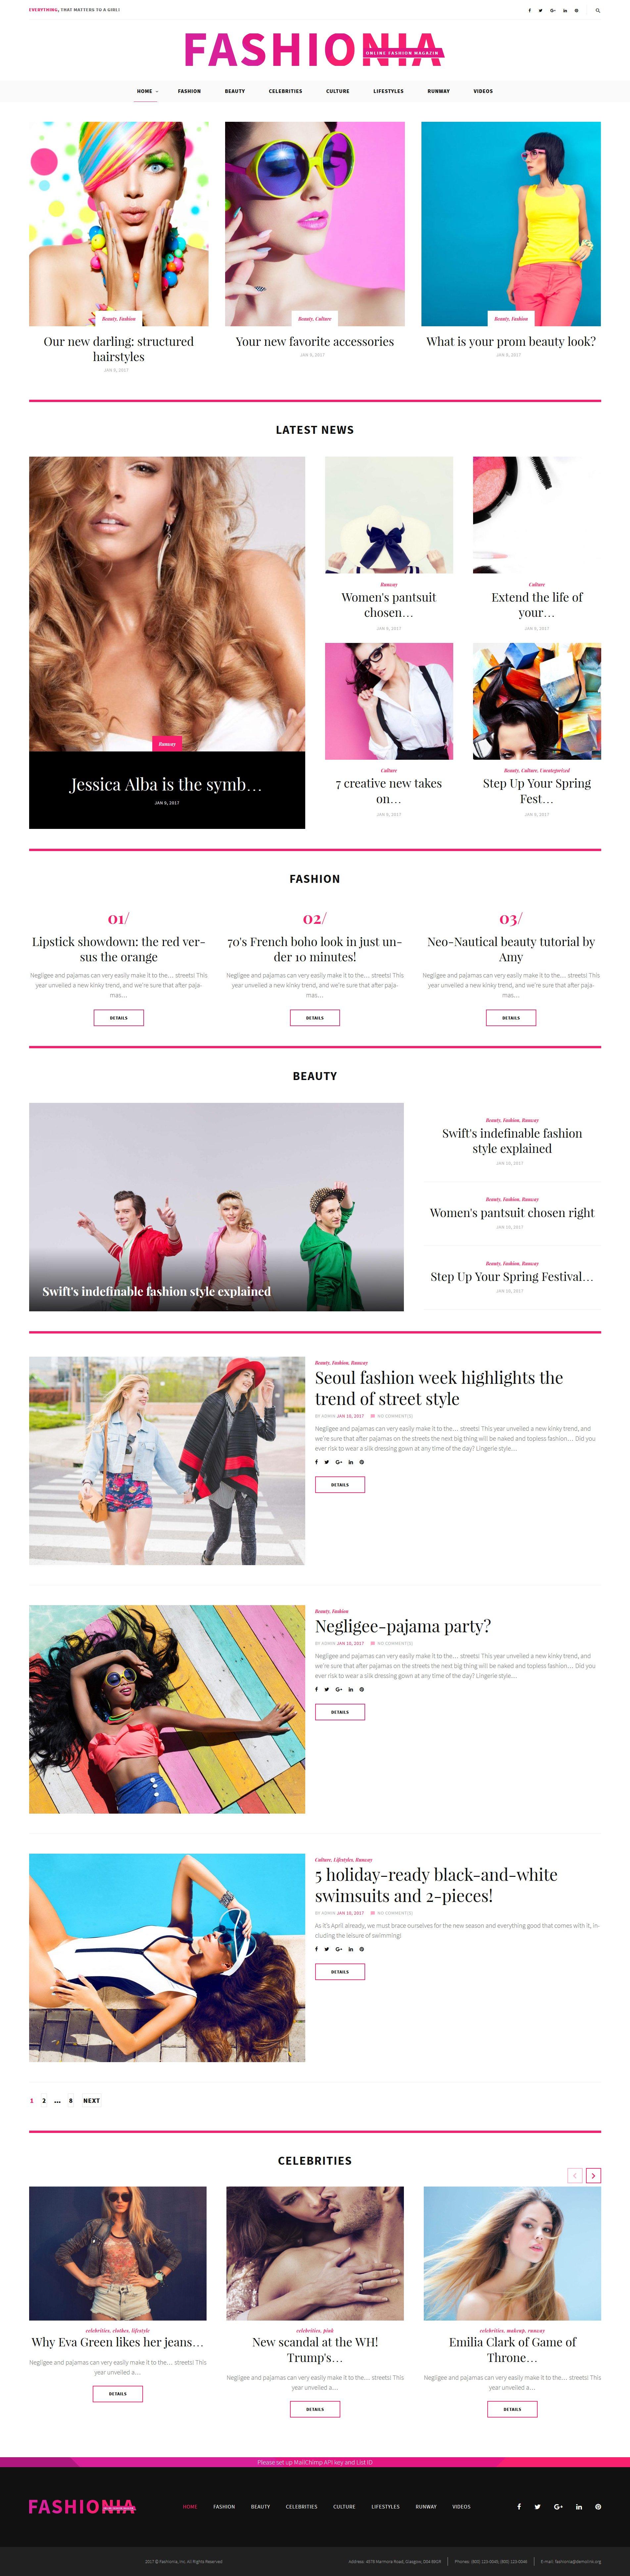 Fashion magazine style blogger template Magazine Blogger Templates 2018 Free Download